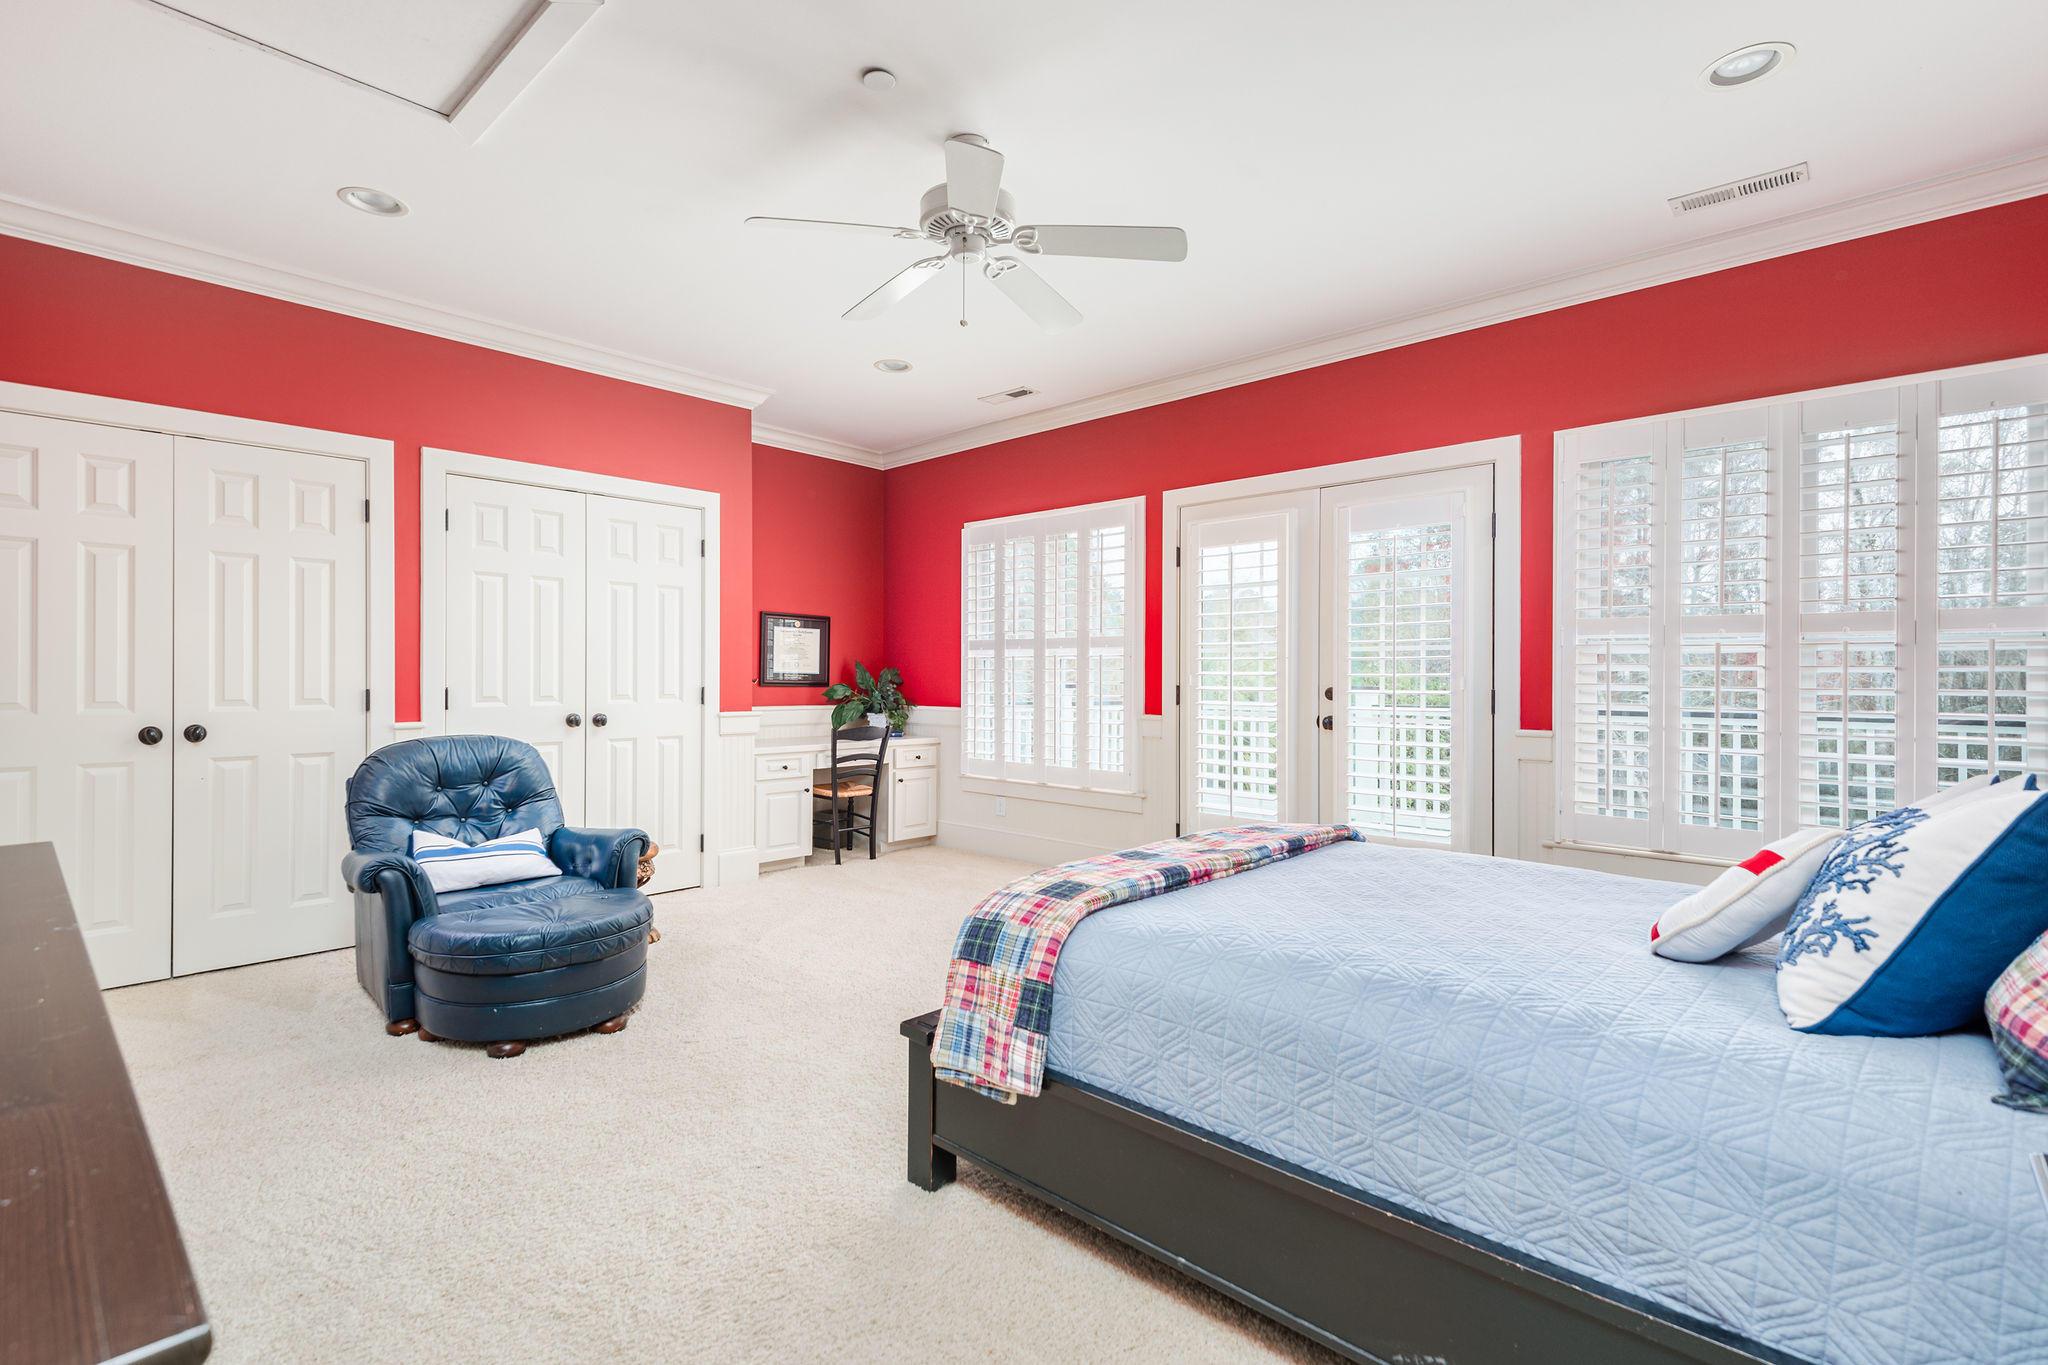 Dunes West Homes For Sale - 1305 King Bird, Mount Pleasant, SC - 1